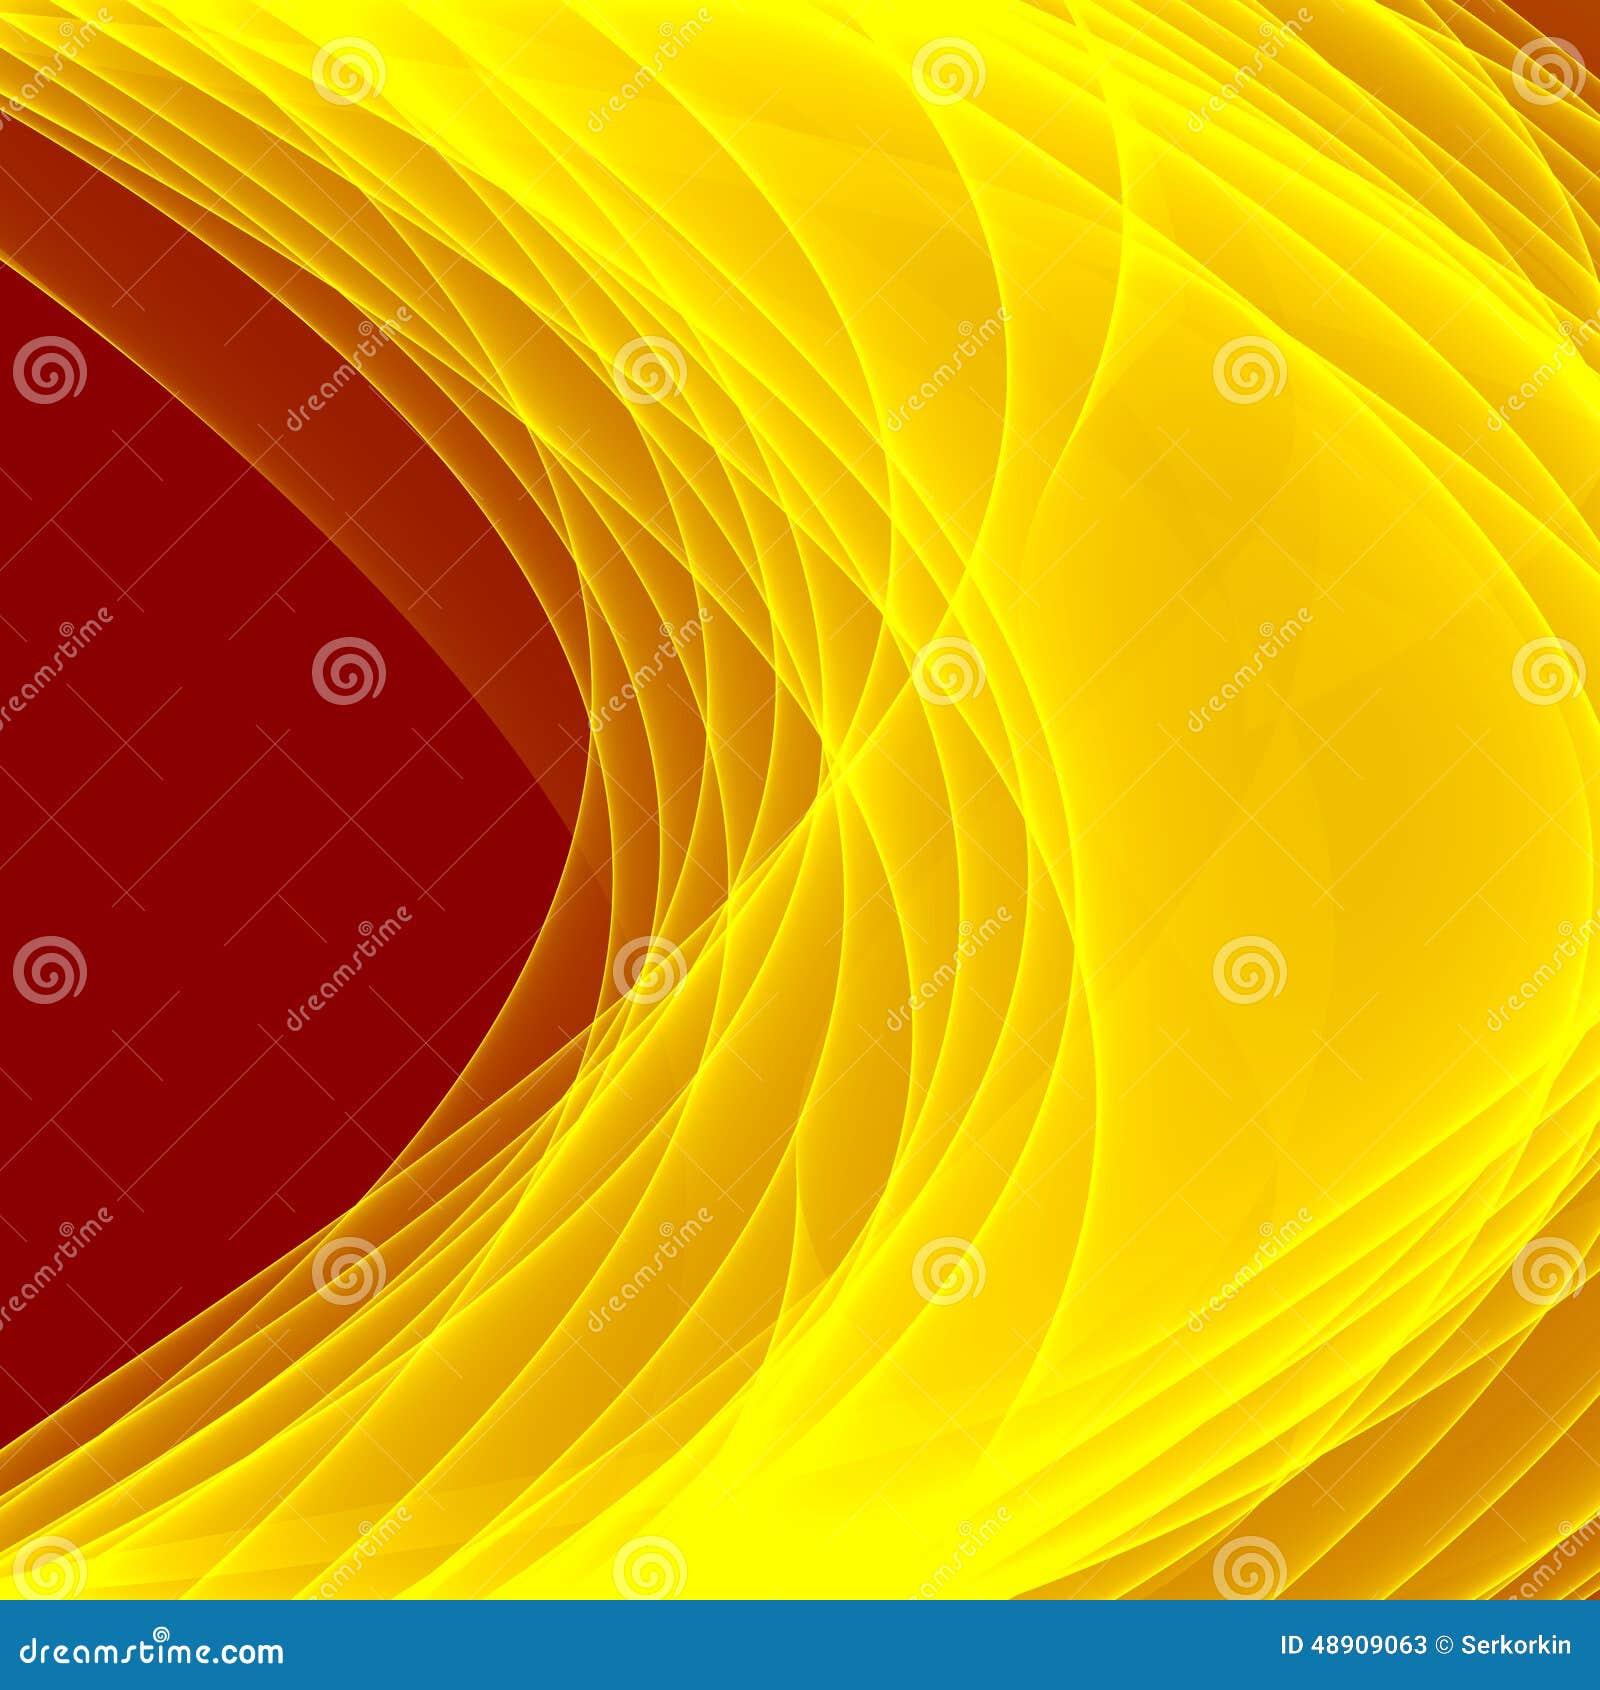 geometric yellow background illustration - photo #33